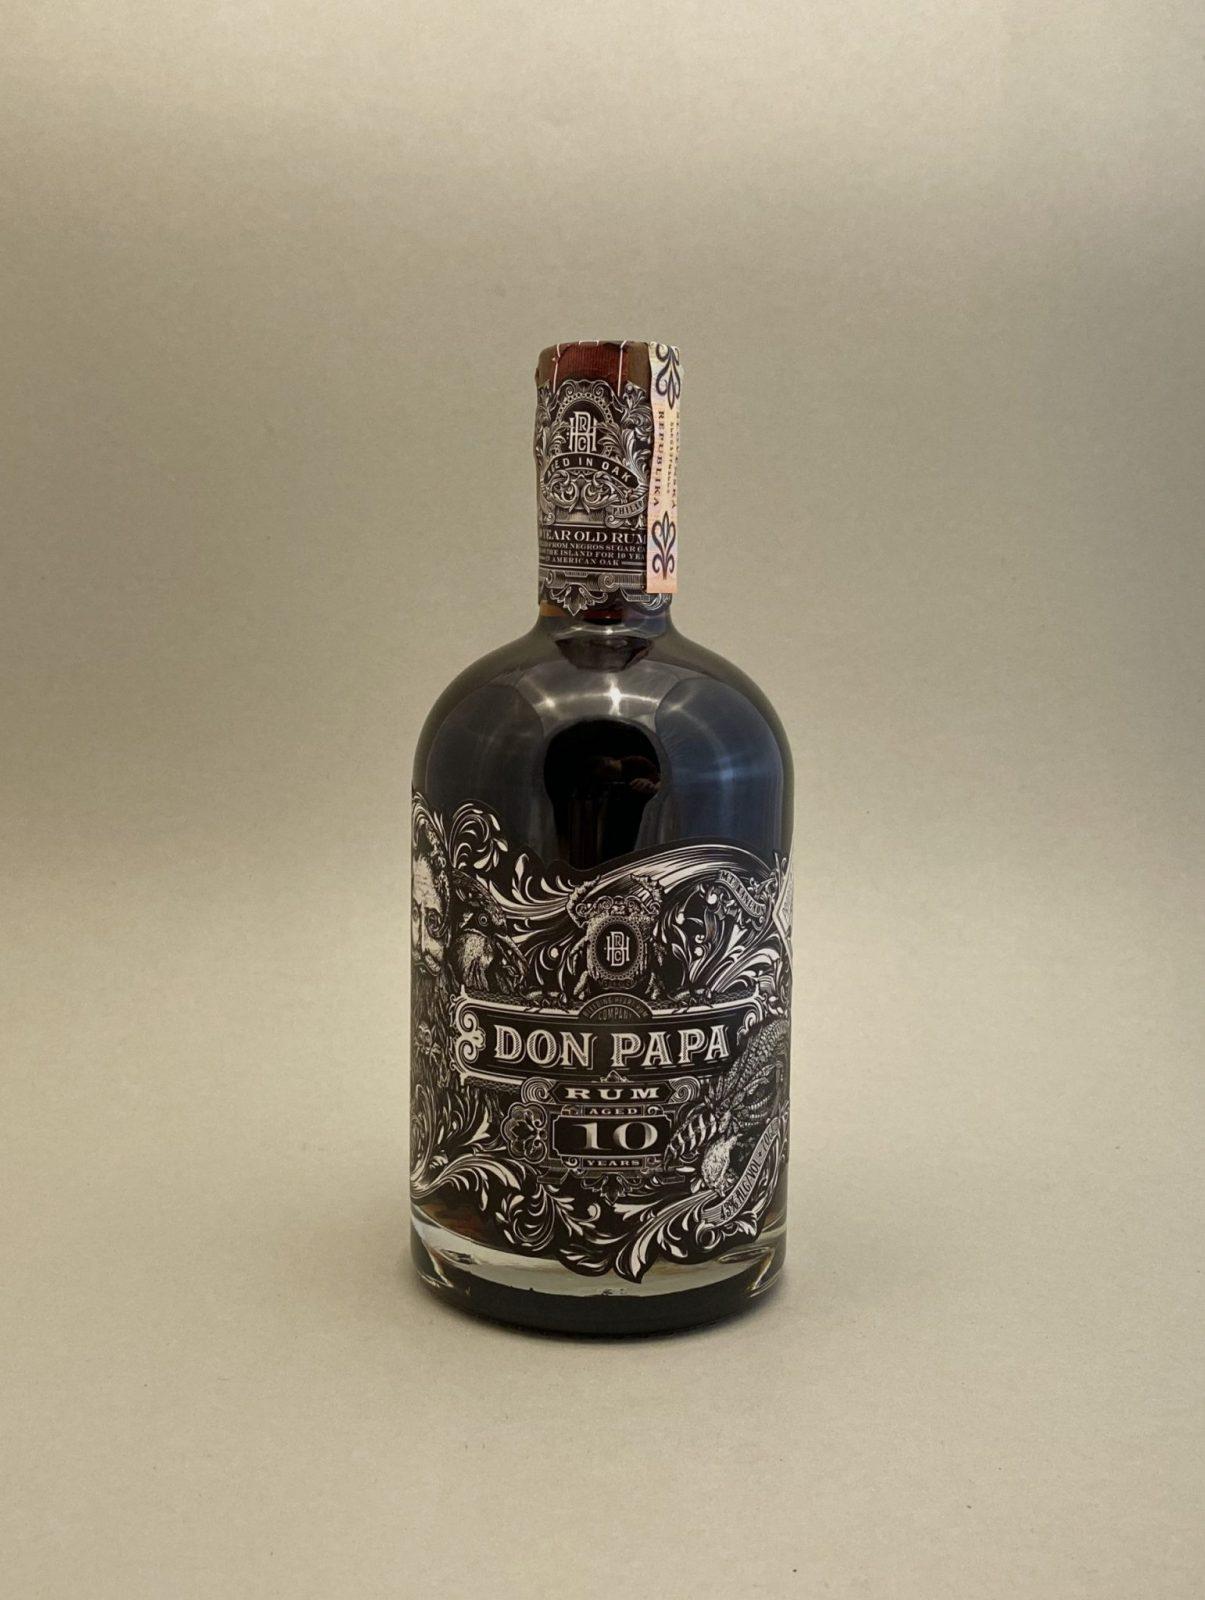 Don Papa 10YO 43%, Bottleshop Sunny wines slnecnice mesto, petrzalka, rum, rumy, rozvoz alkoholu, eshop